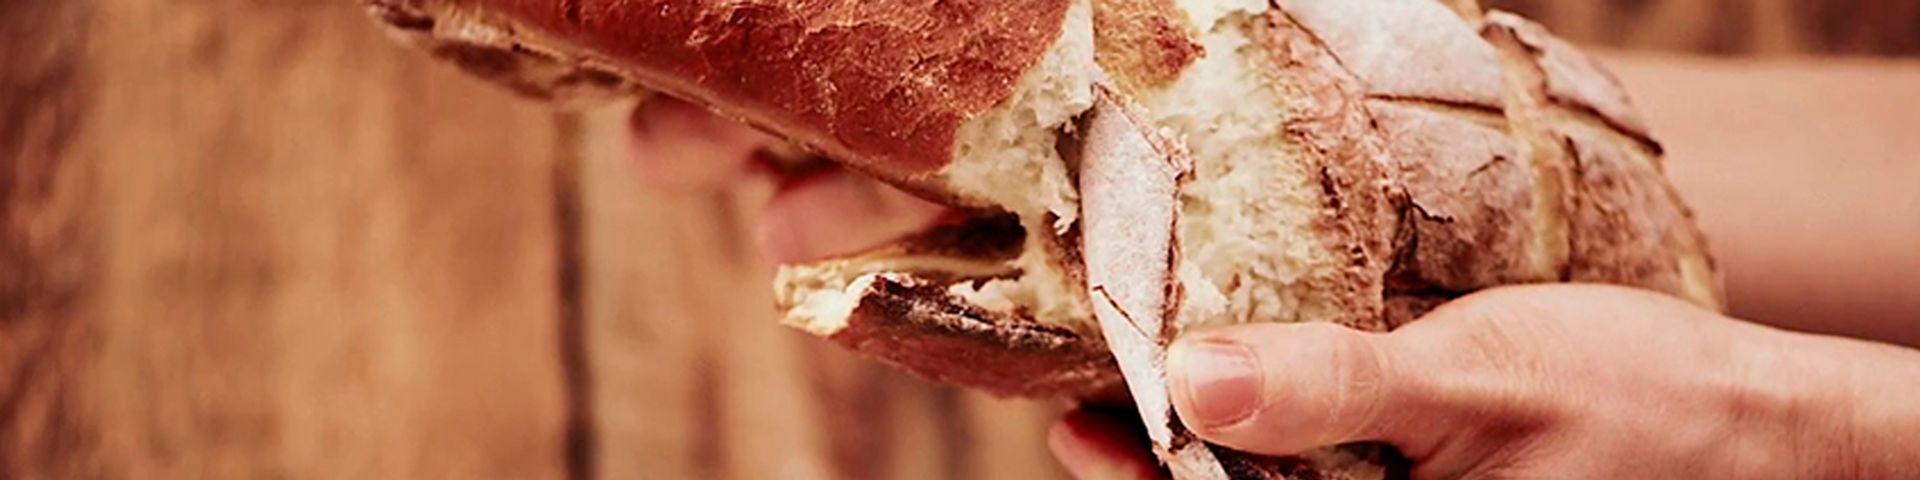 Cata del pan